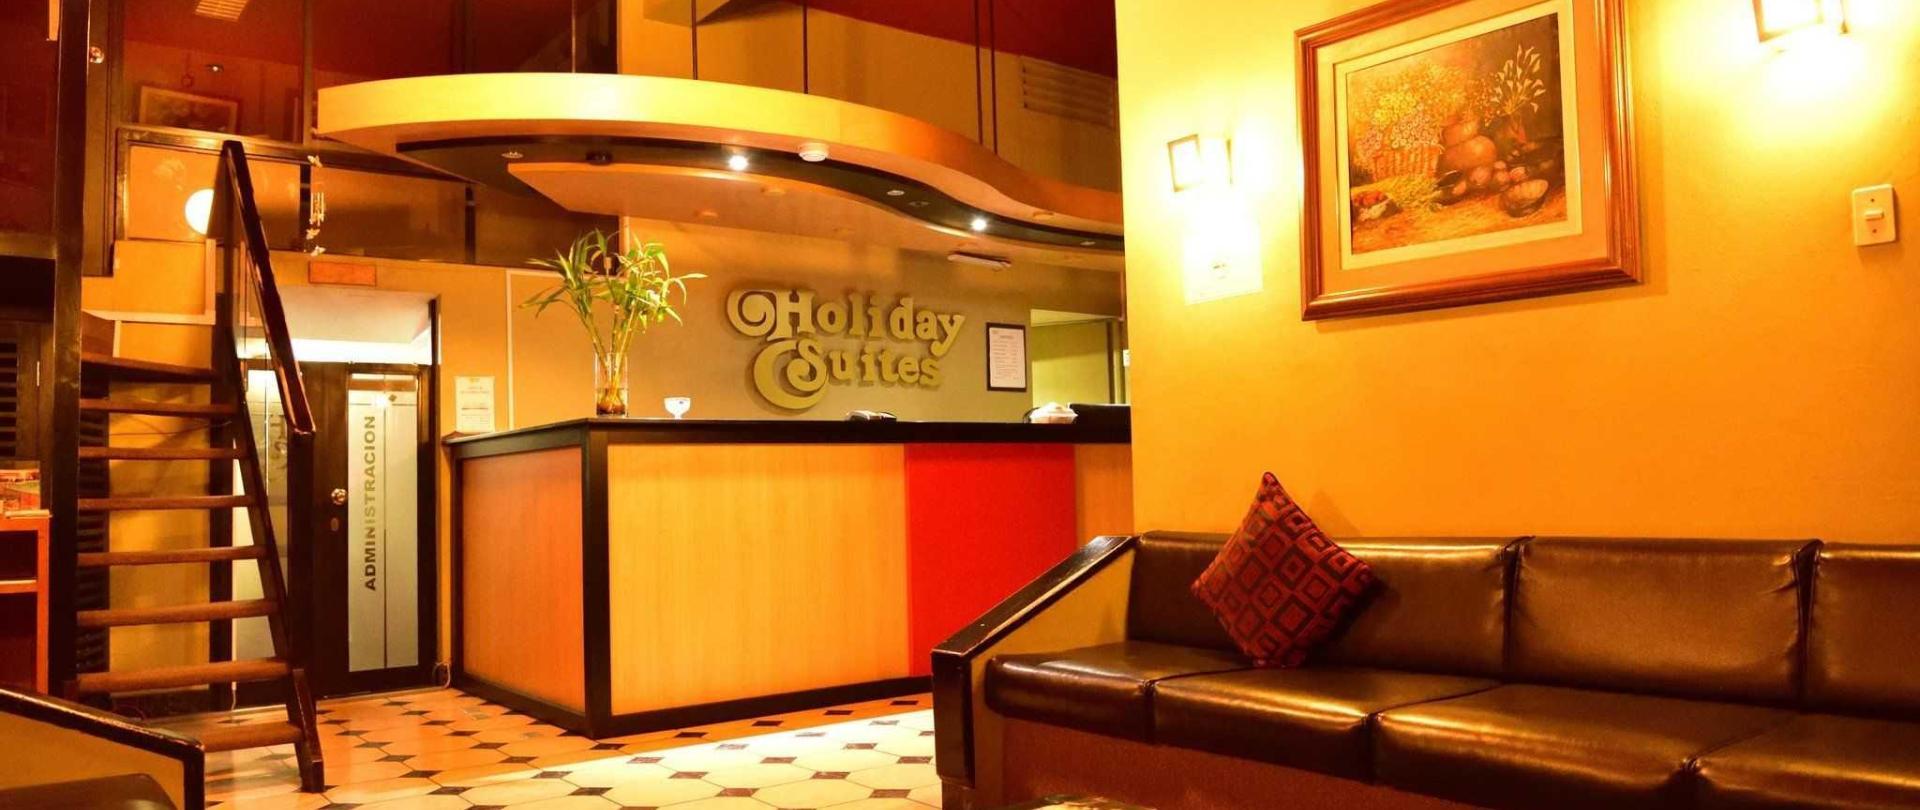 hotel-holiday-suites-3-estrellas-tacna-sala-de-espera-4.jpg